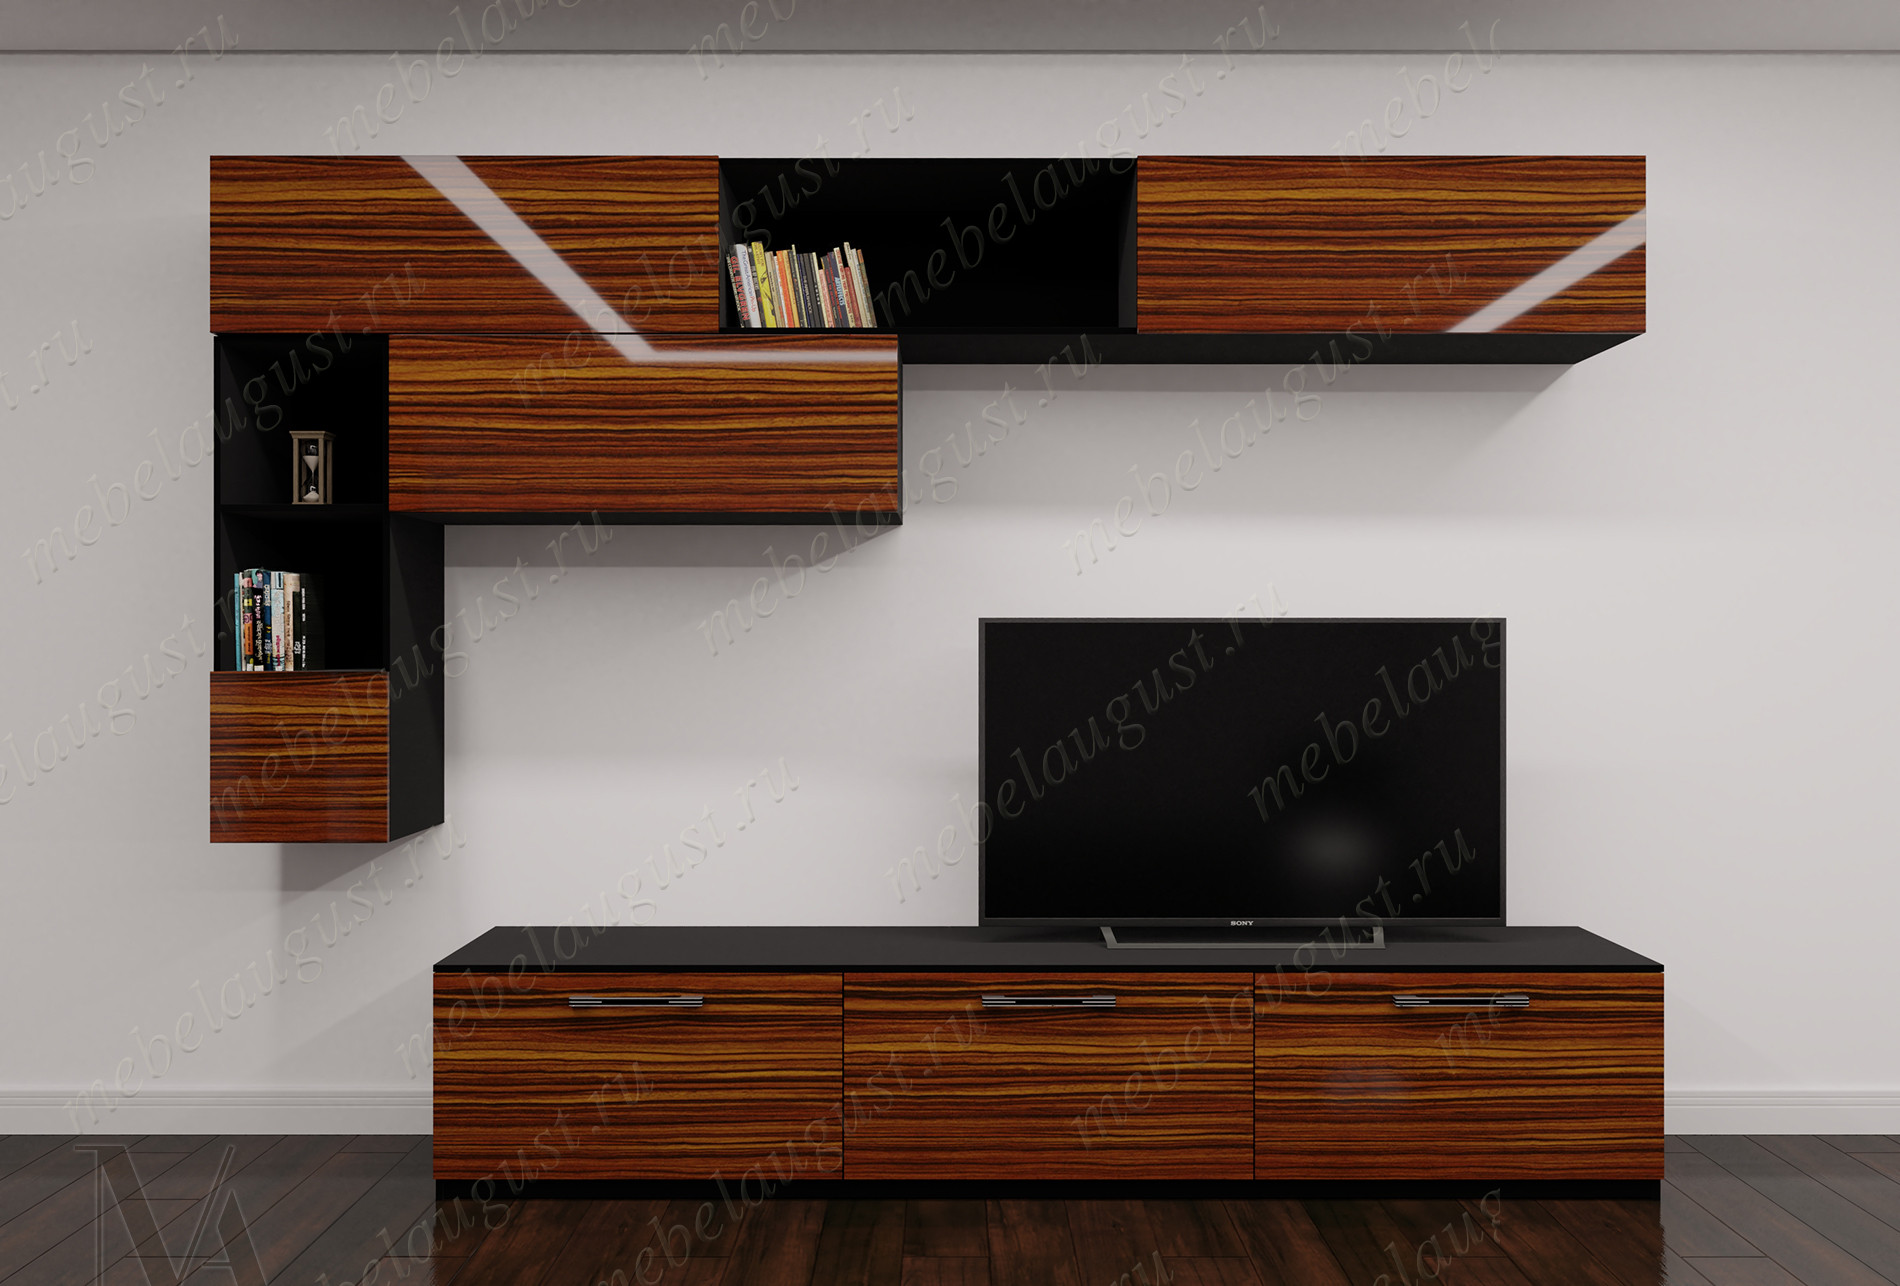 Глянцевая малогабаритная модульная мебельная стенка в спальню